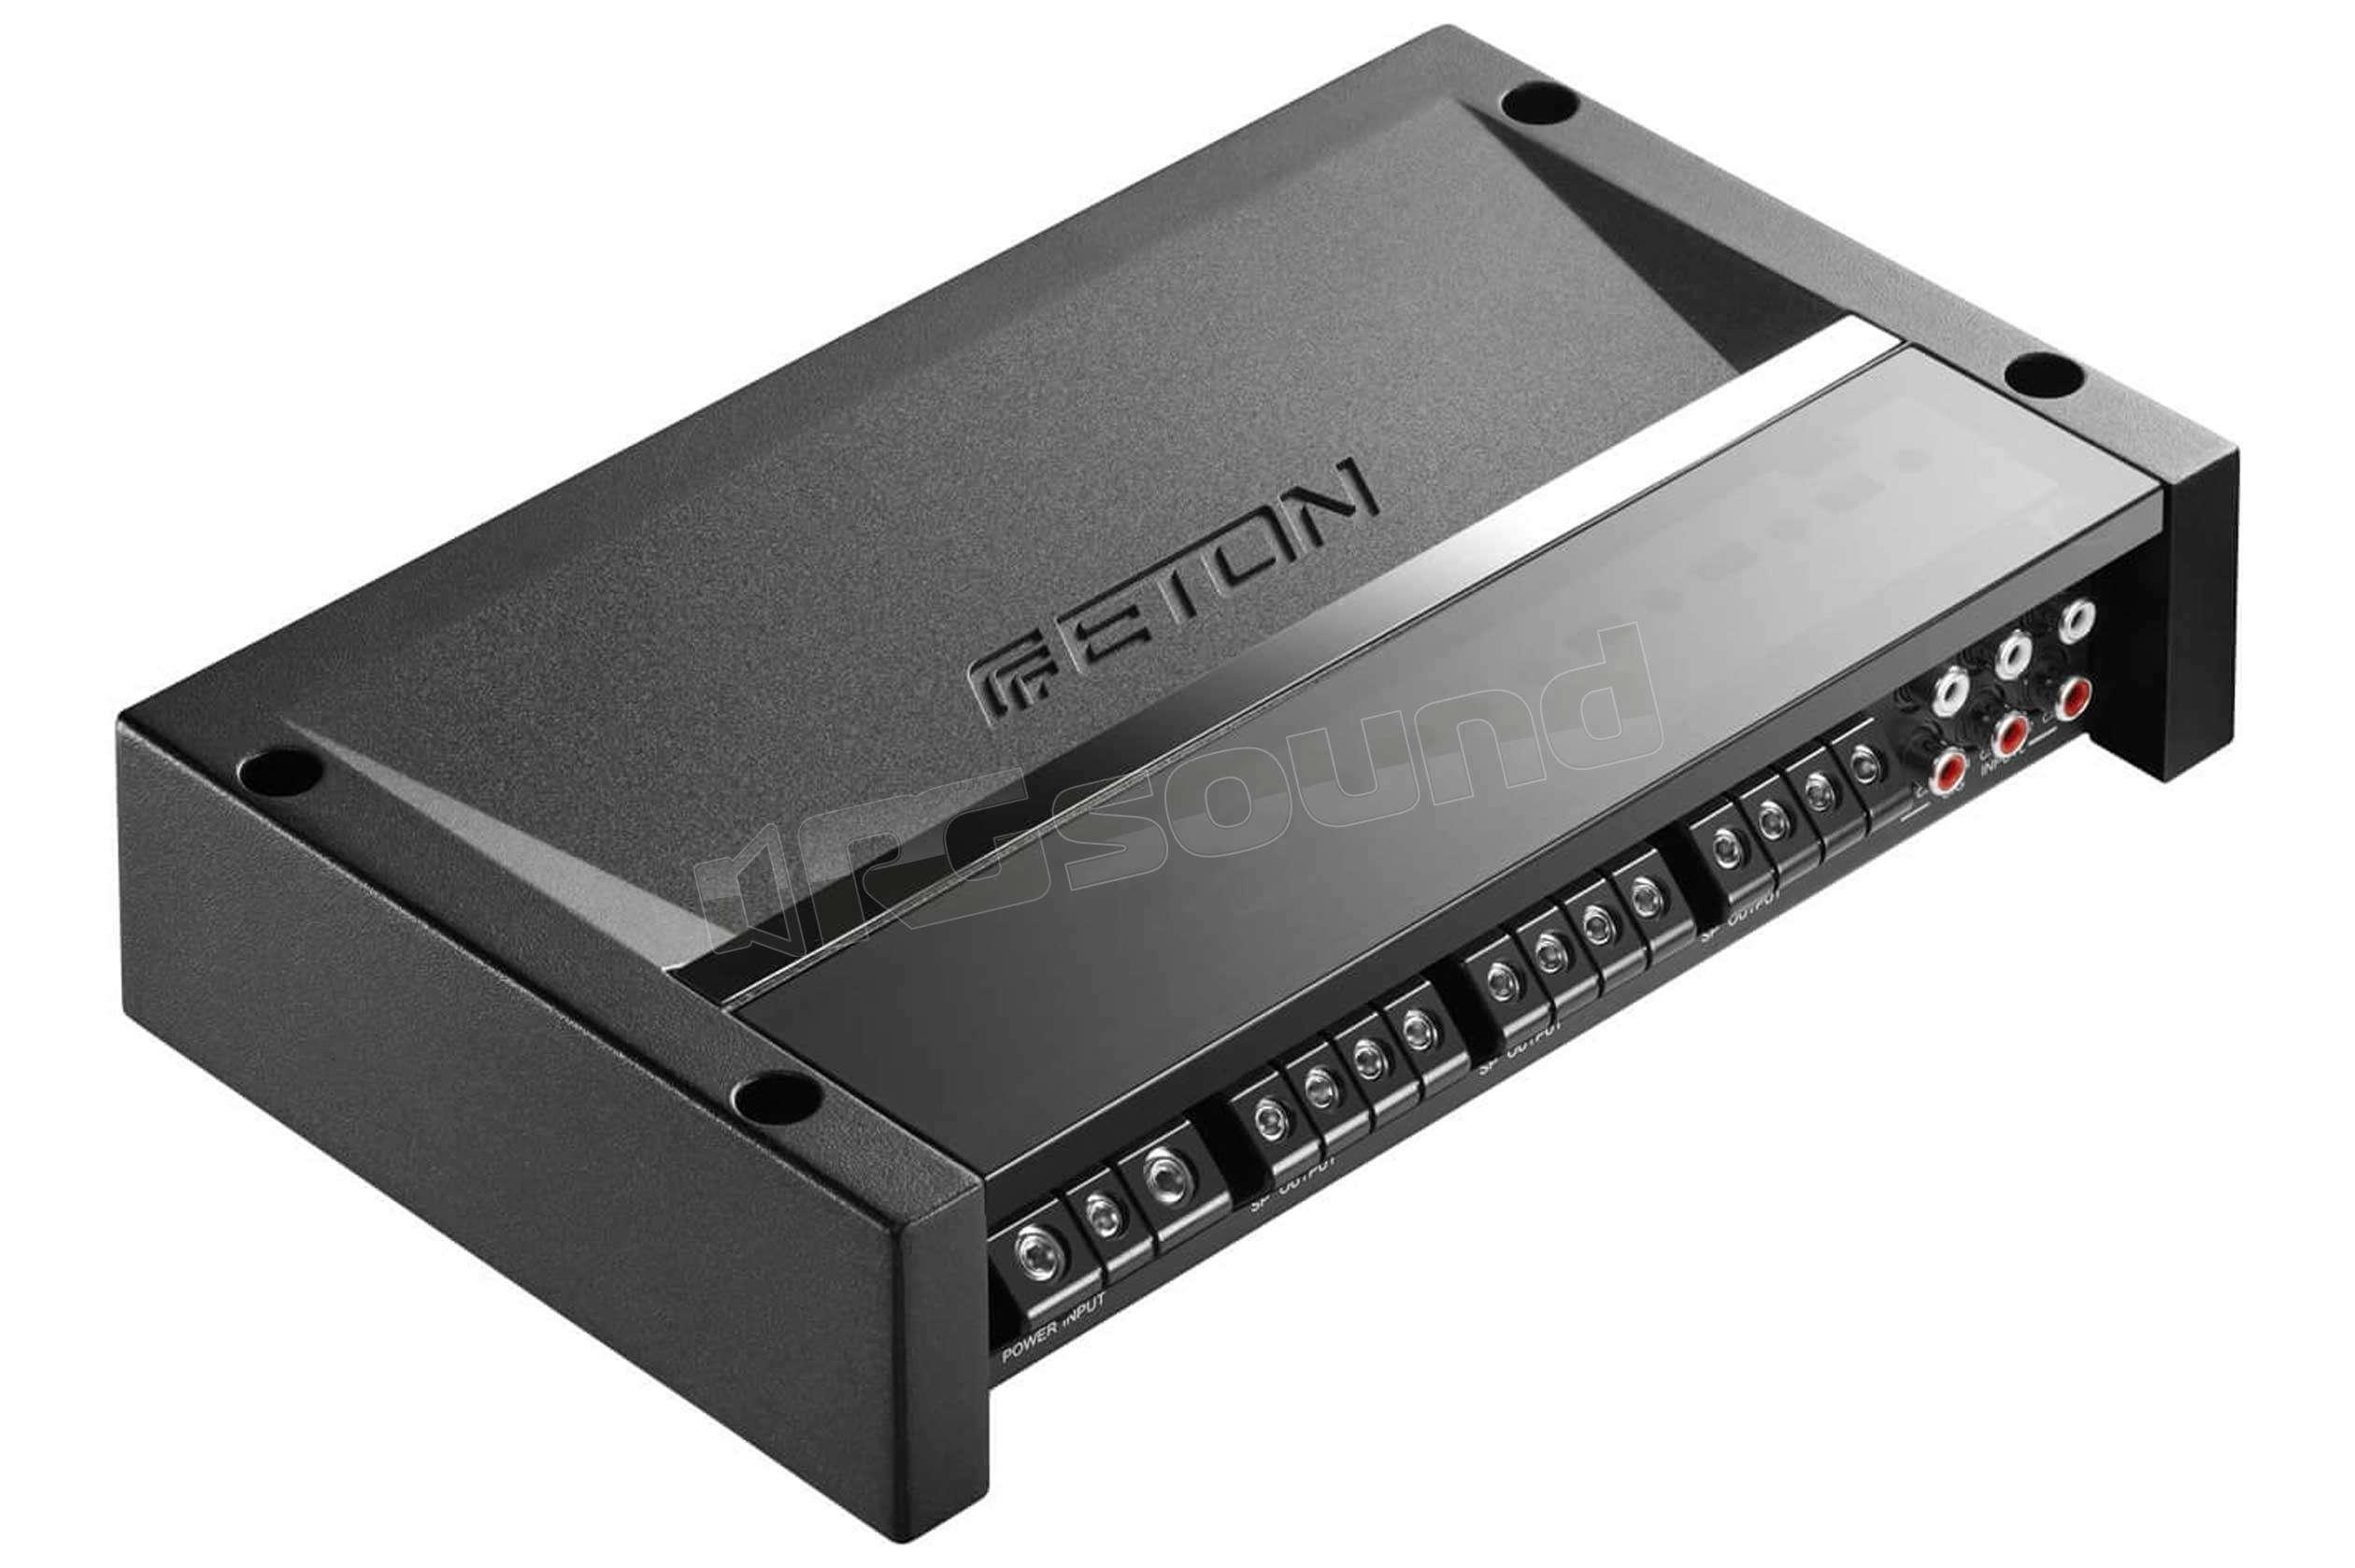 ETON SDA 100.6 amplificatore 6 canali in Classe D | Amplificatori